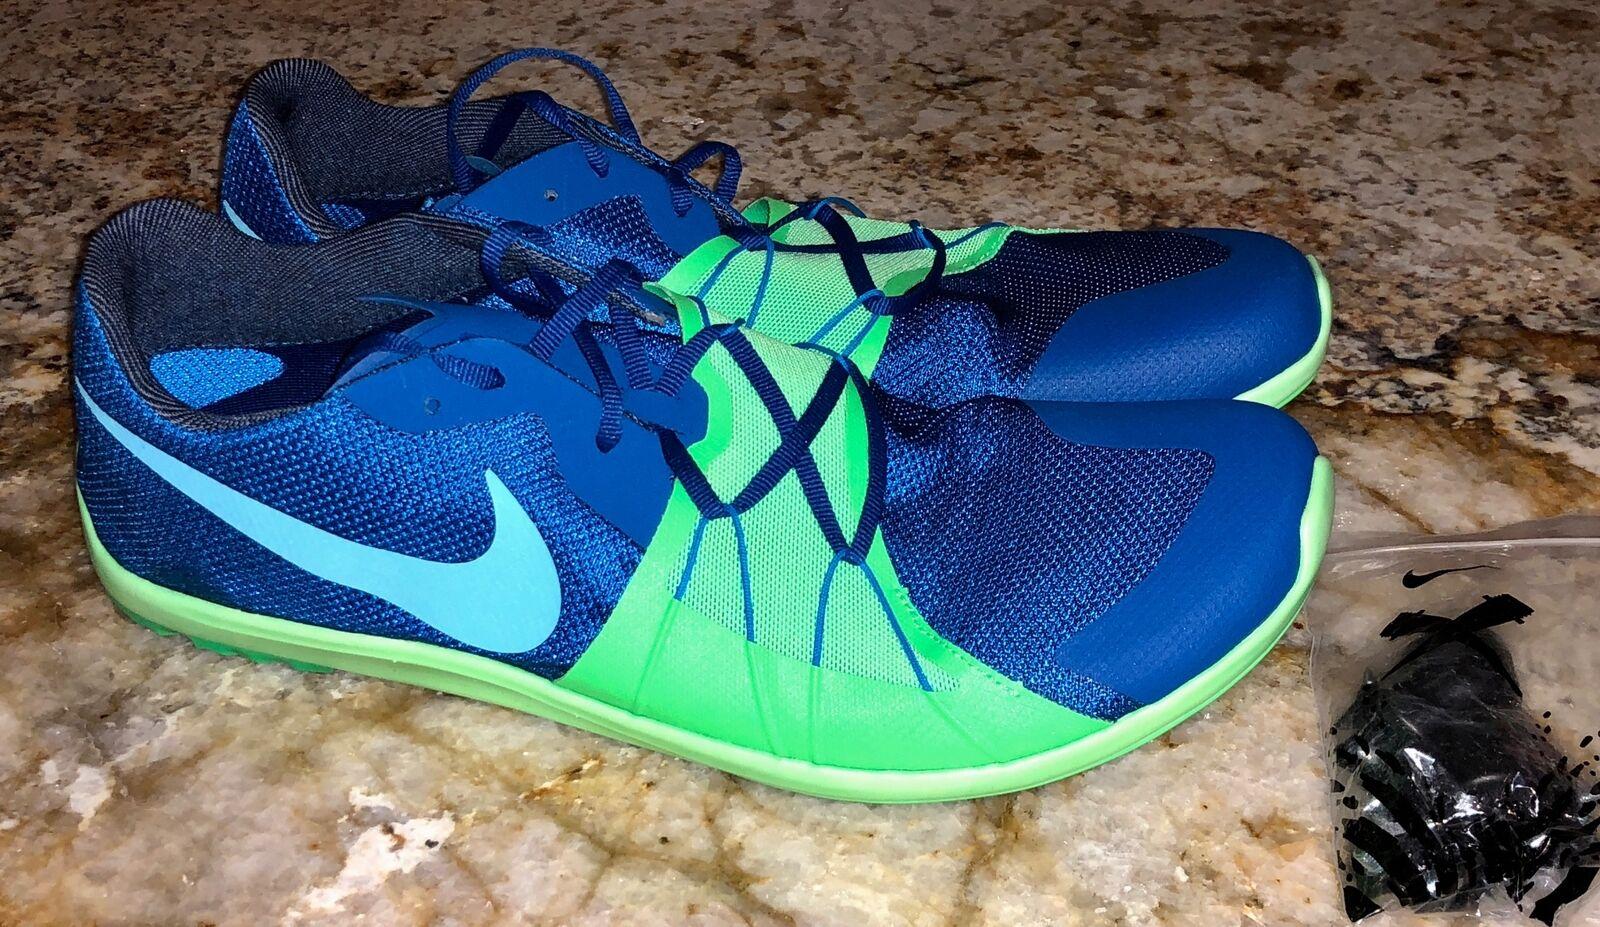 Nike zoom ewig xc 5 blauen jay spitzen kalk cross country spitzen jay schuhen neue herren - sz - 11. b51406